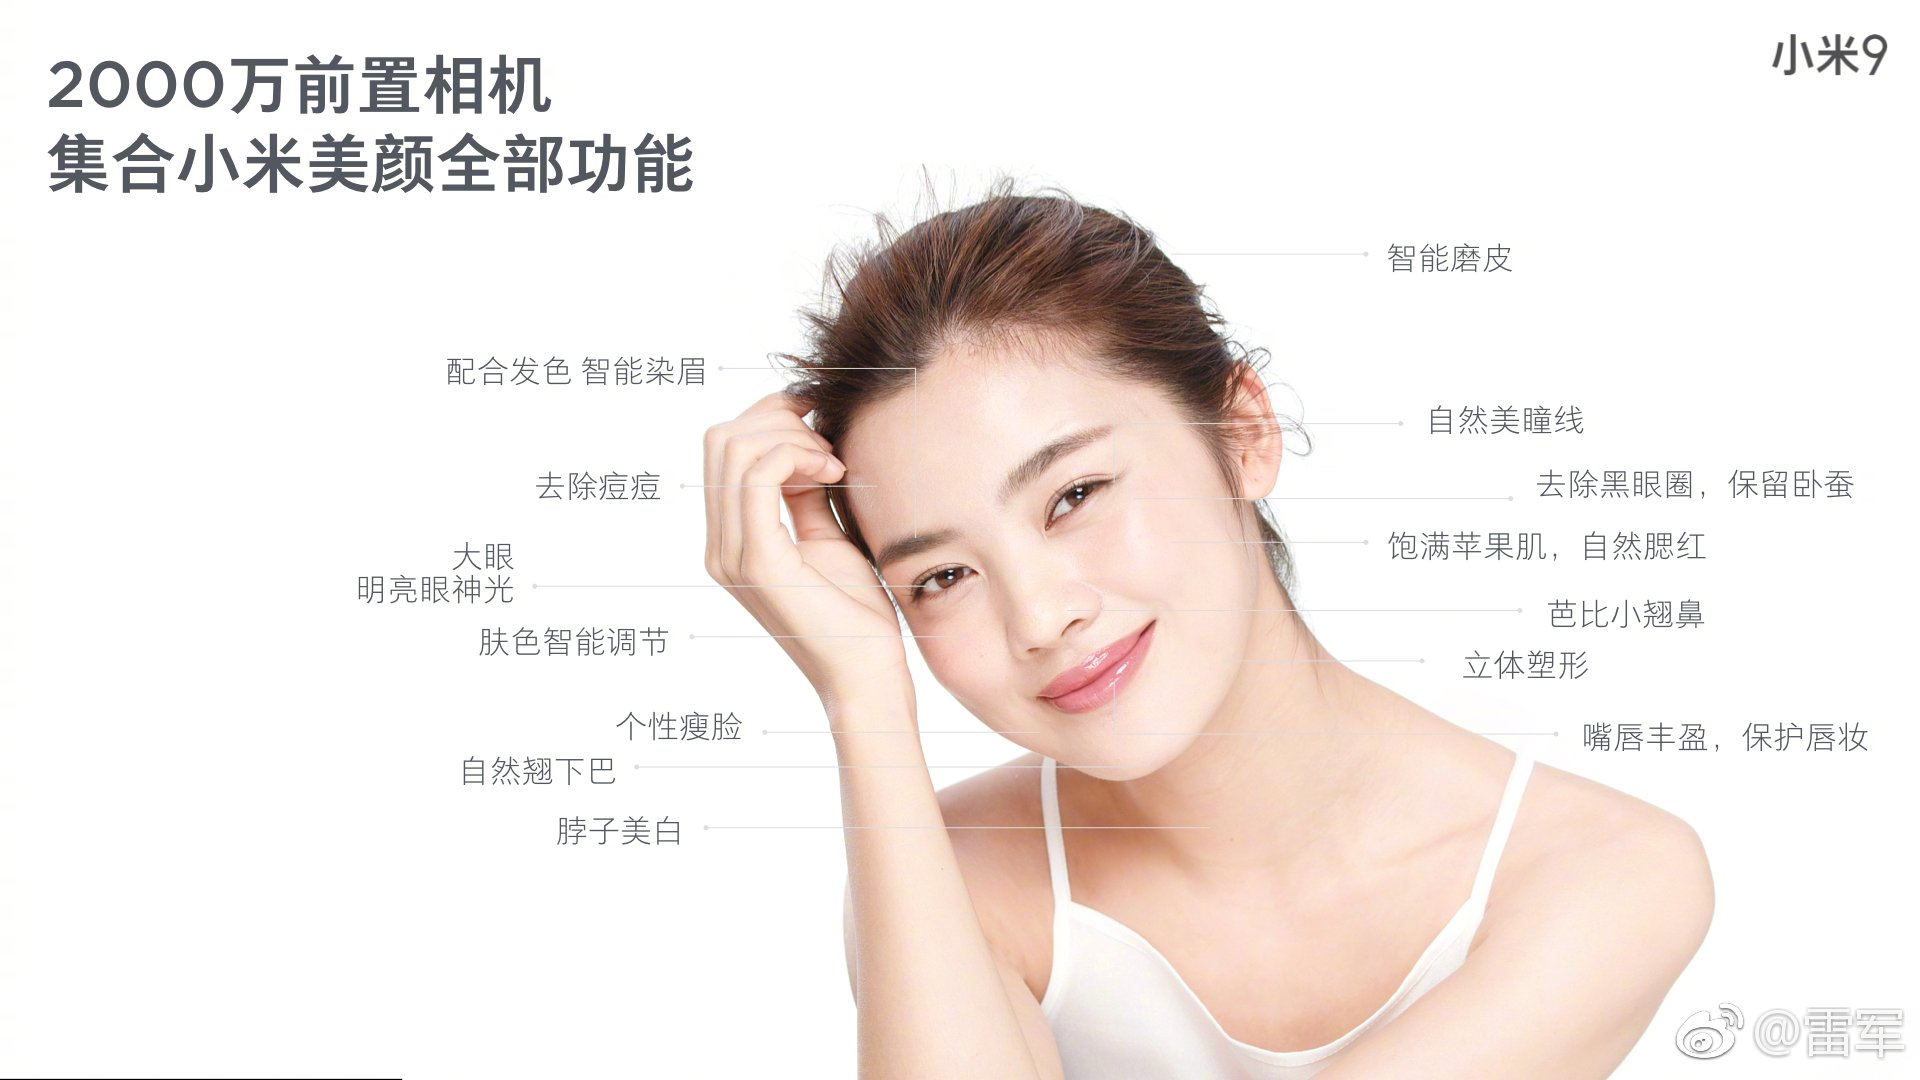 Xiaomi Mi 9 Complete Specifications 4